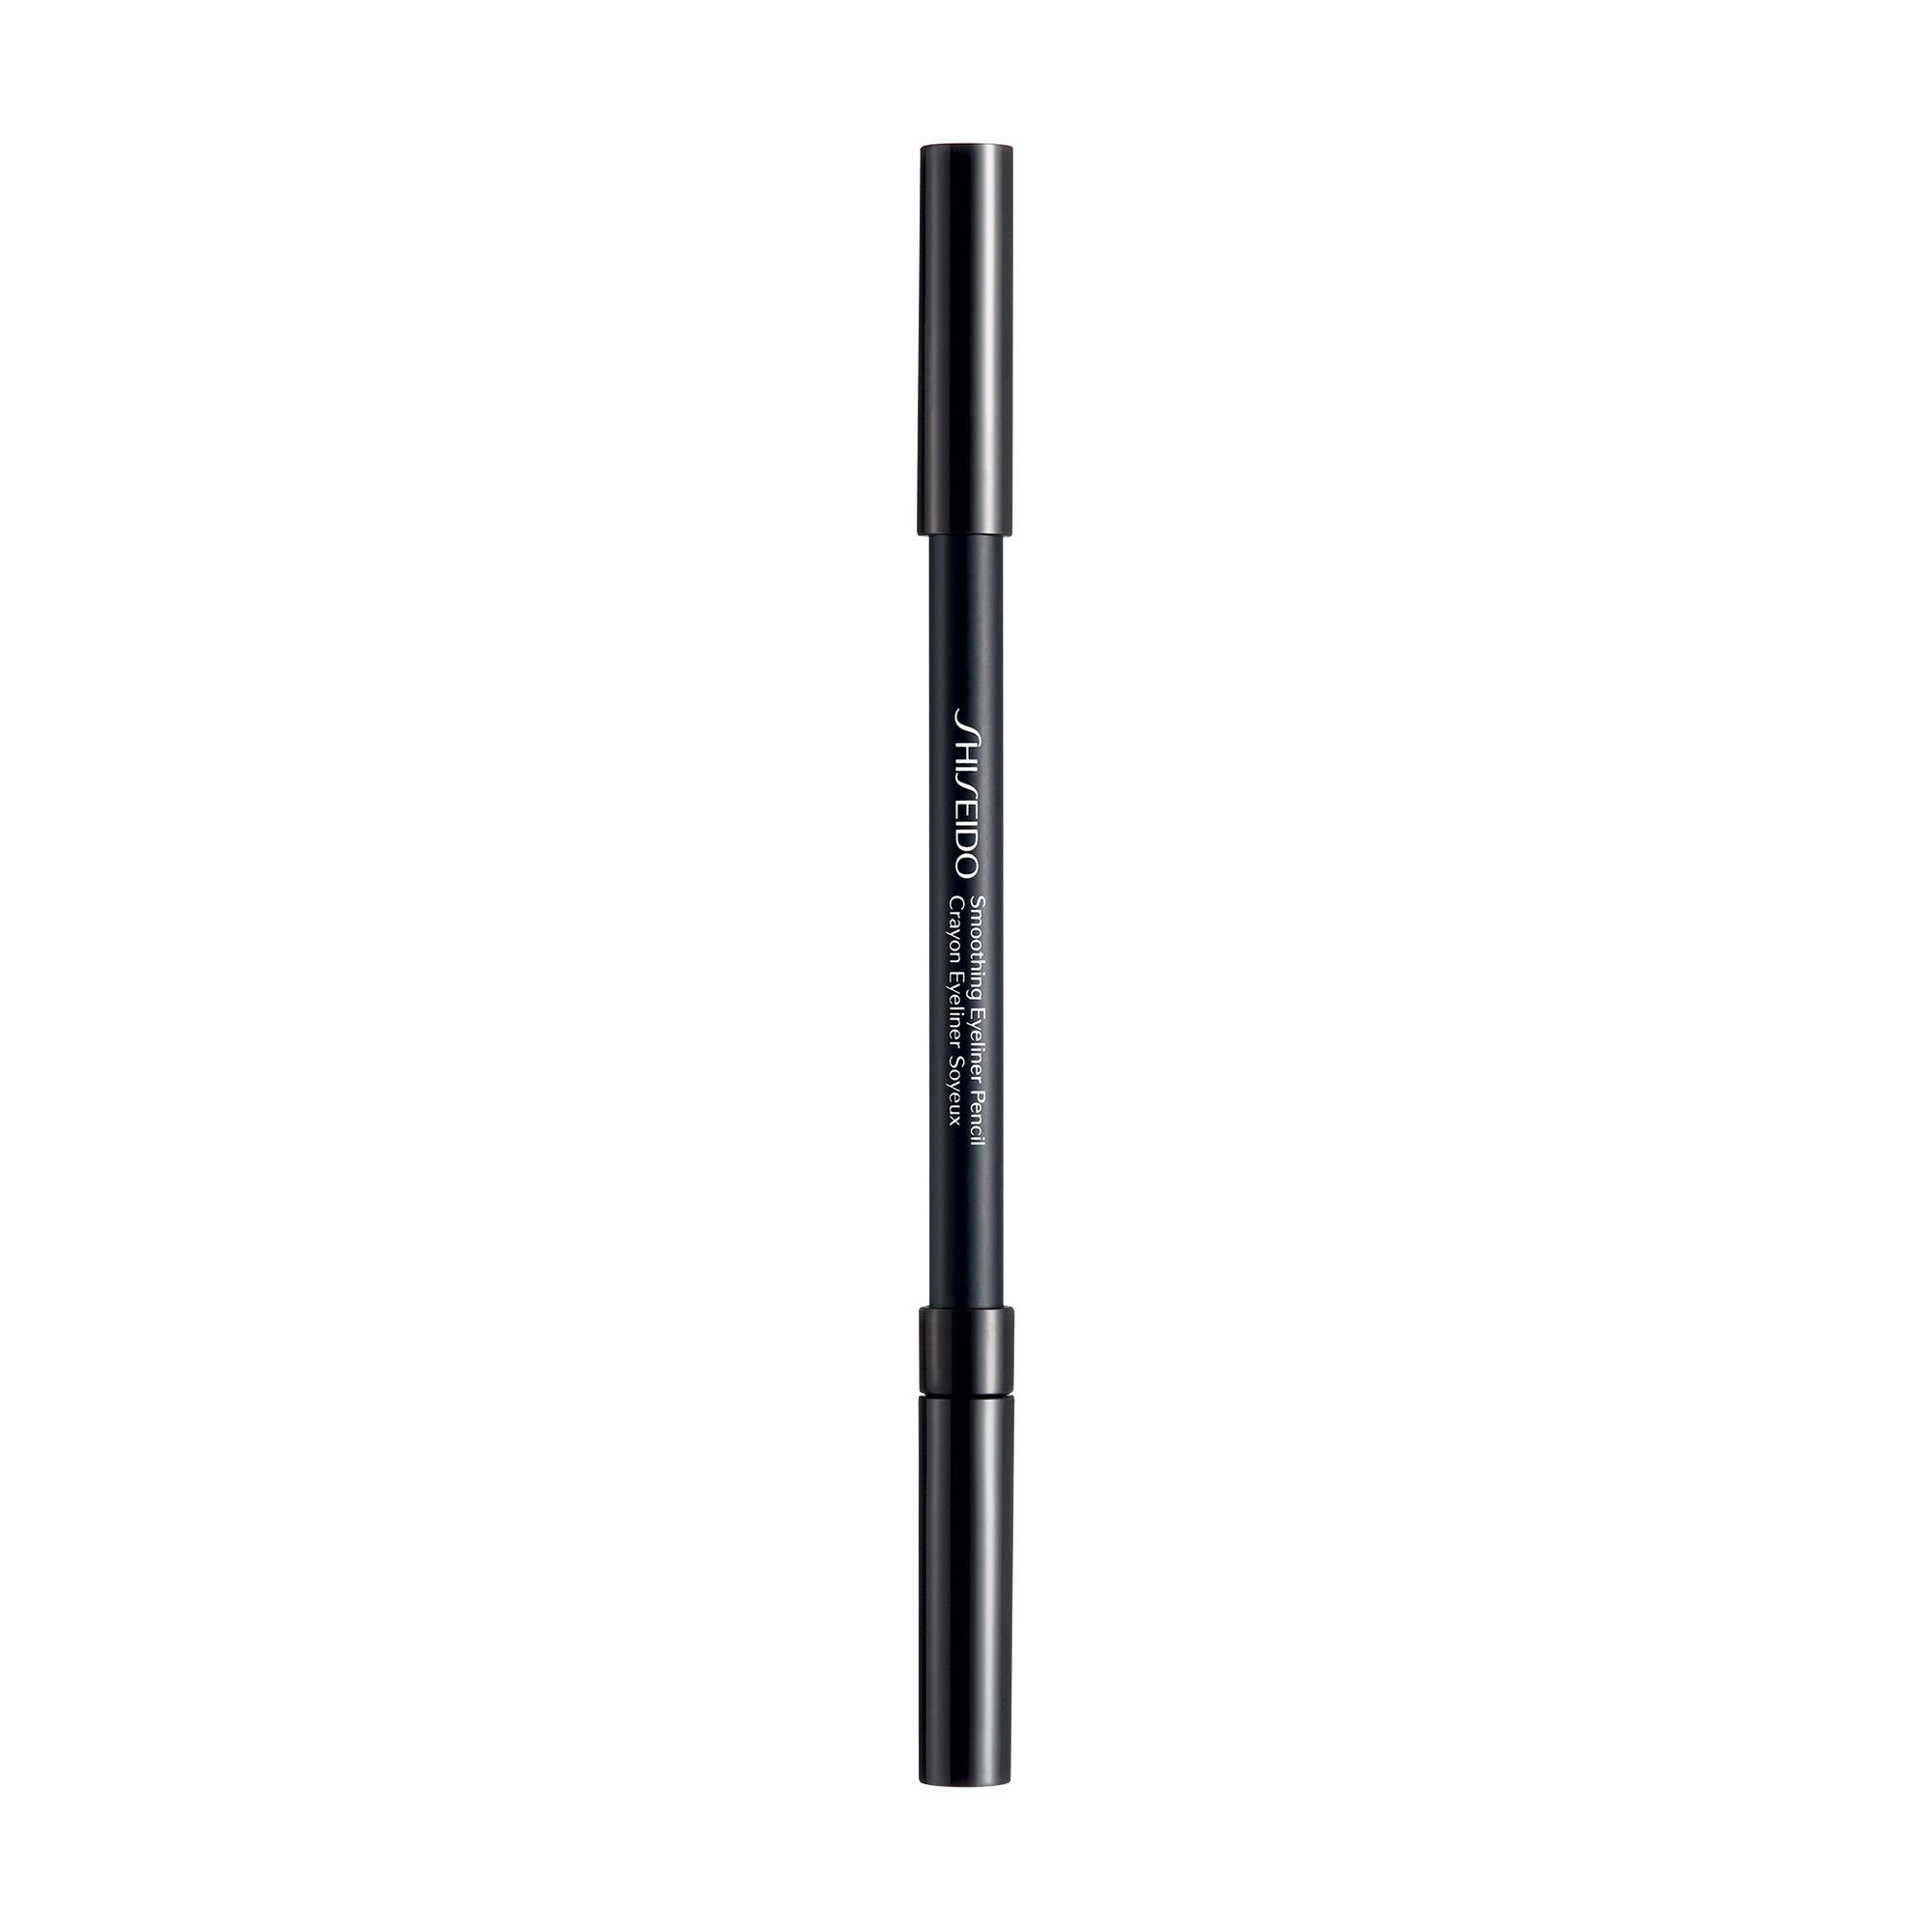 Smoothing Eyeliner Pencil, BK901